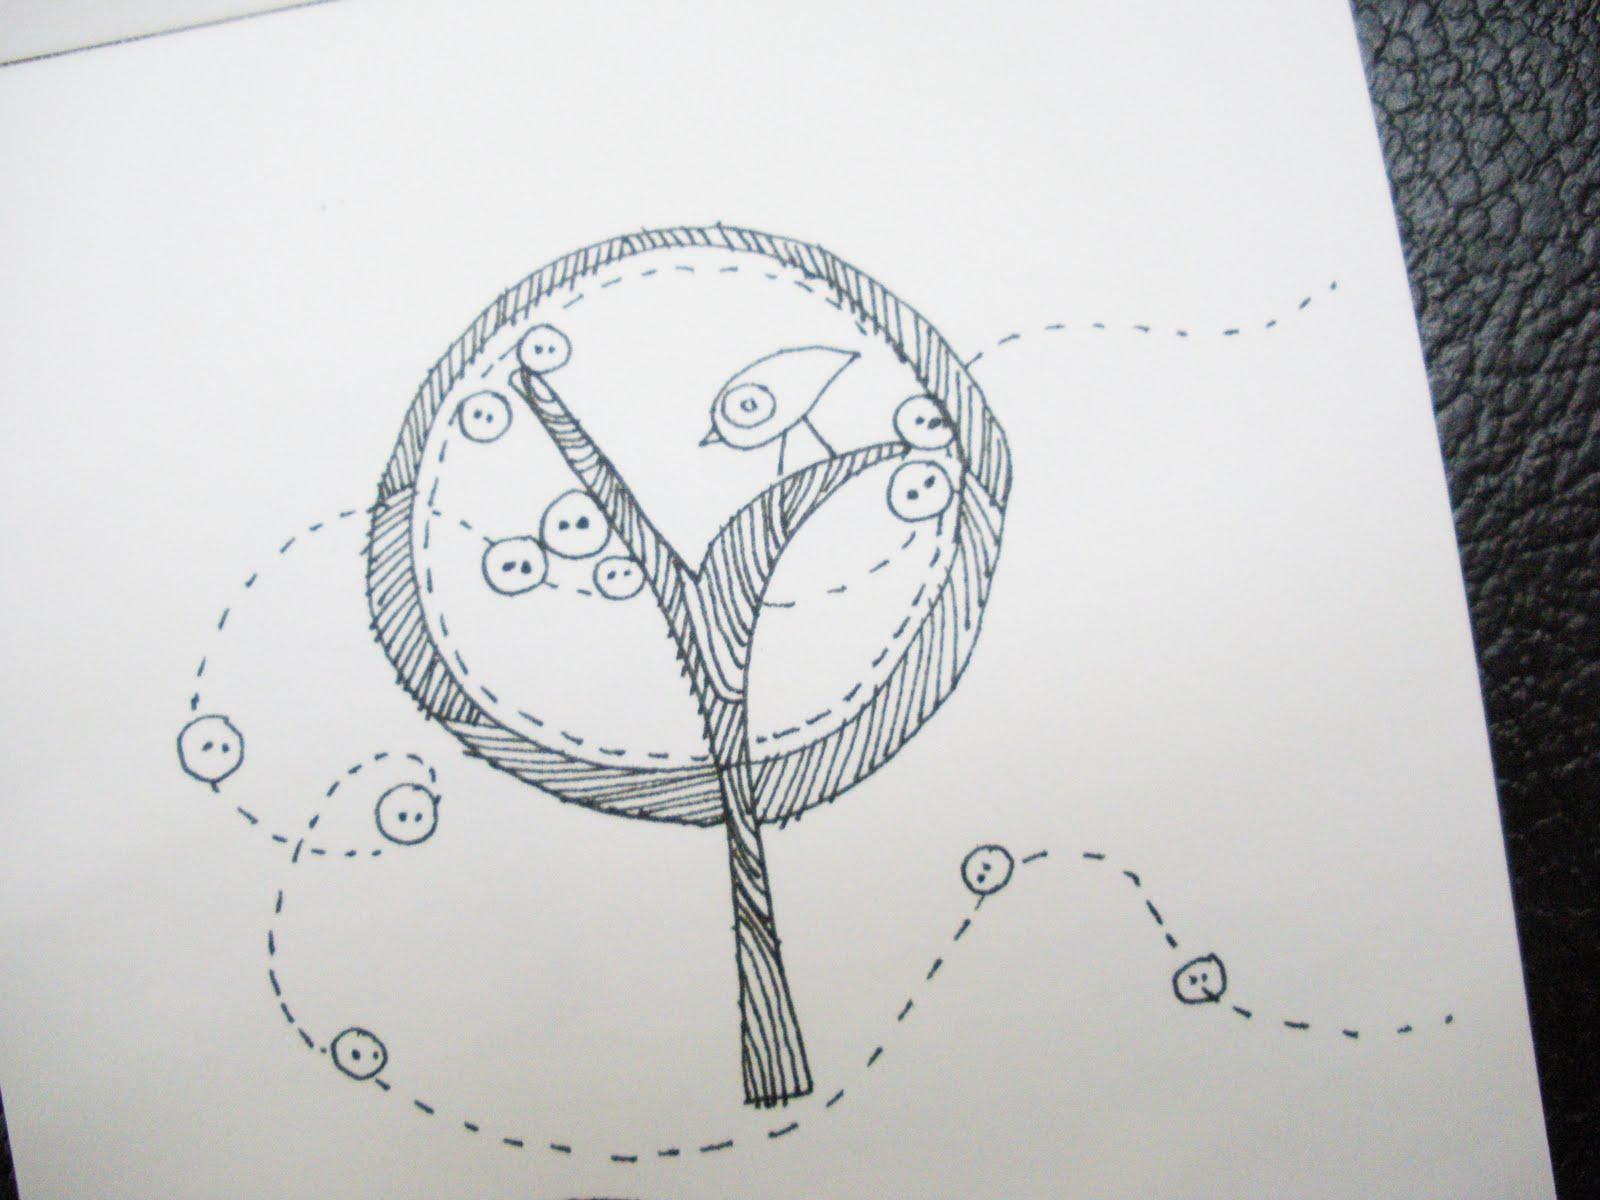 Simple Sketch Ideas   www.imgkid.com - The Image Kid Has It!